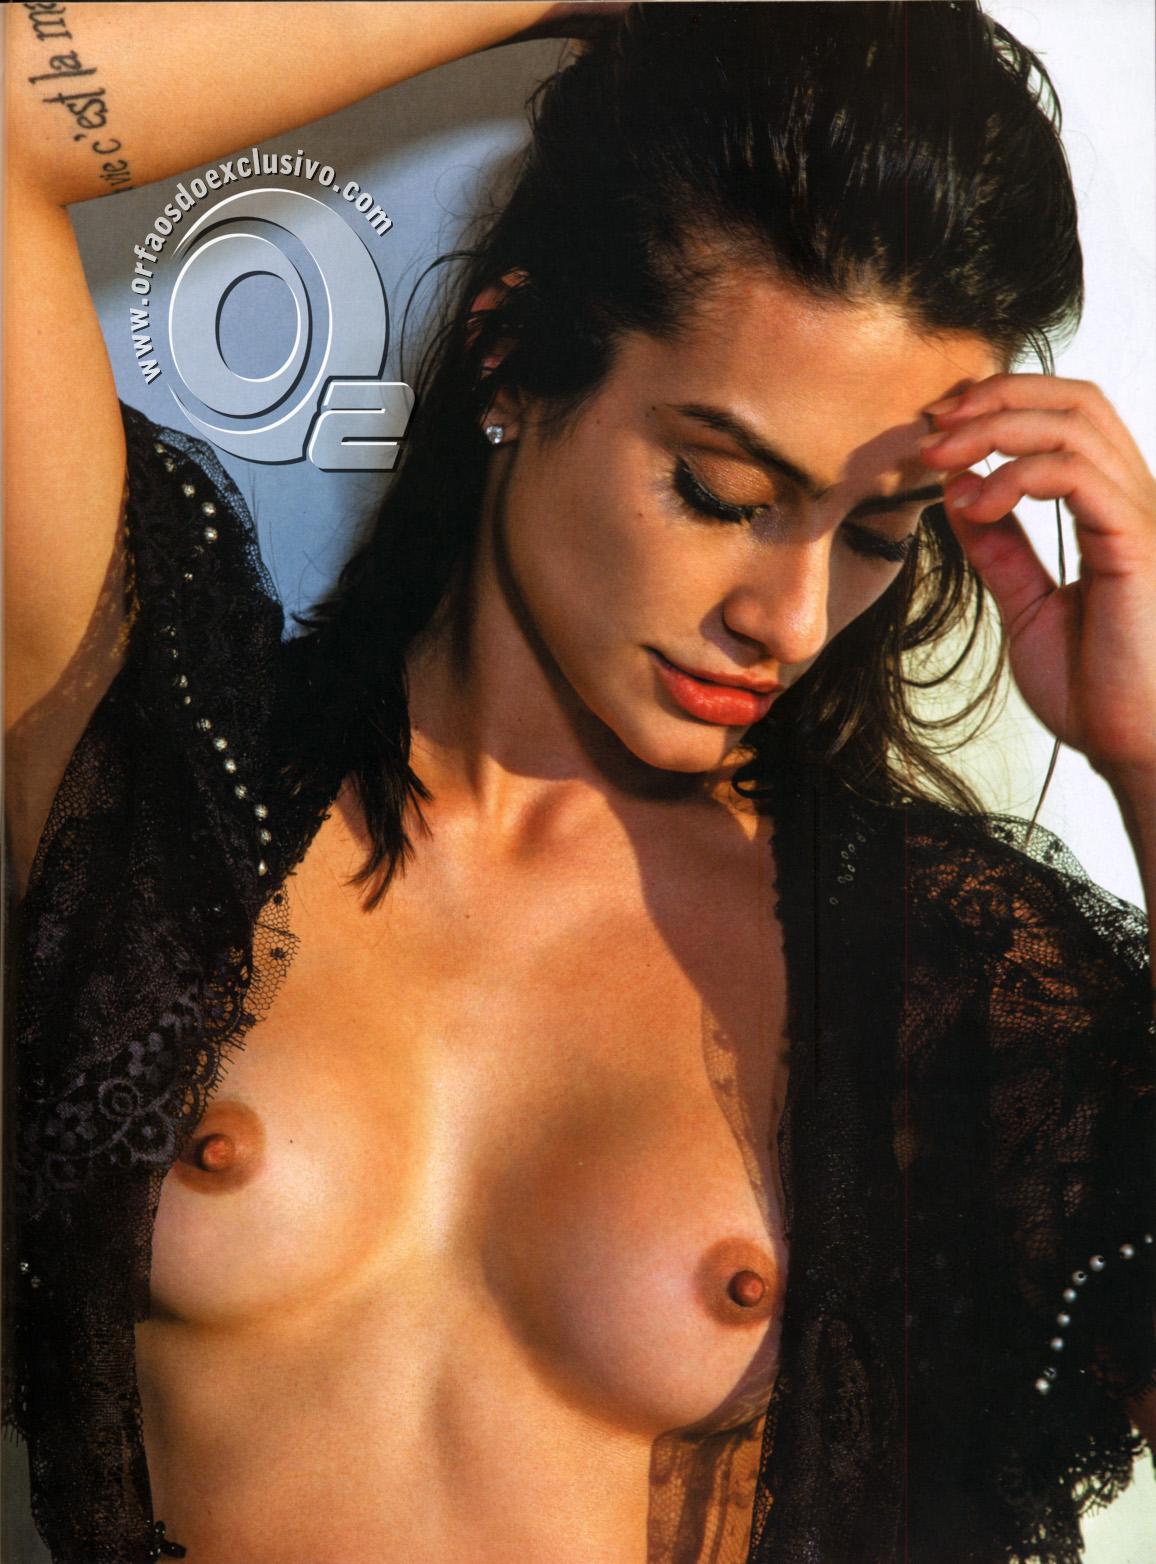 http://3.bp.blogspot.com/-vYRLcl0uOBU/T8kr_m0qT-I/AAAAAAAABM4/cevkMMbrirg/s1600/revista+playboy+capa+as+mulheres+do+mundo+playboy+maio+2011+editora+abril+(10).jpg